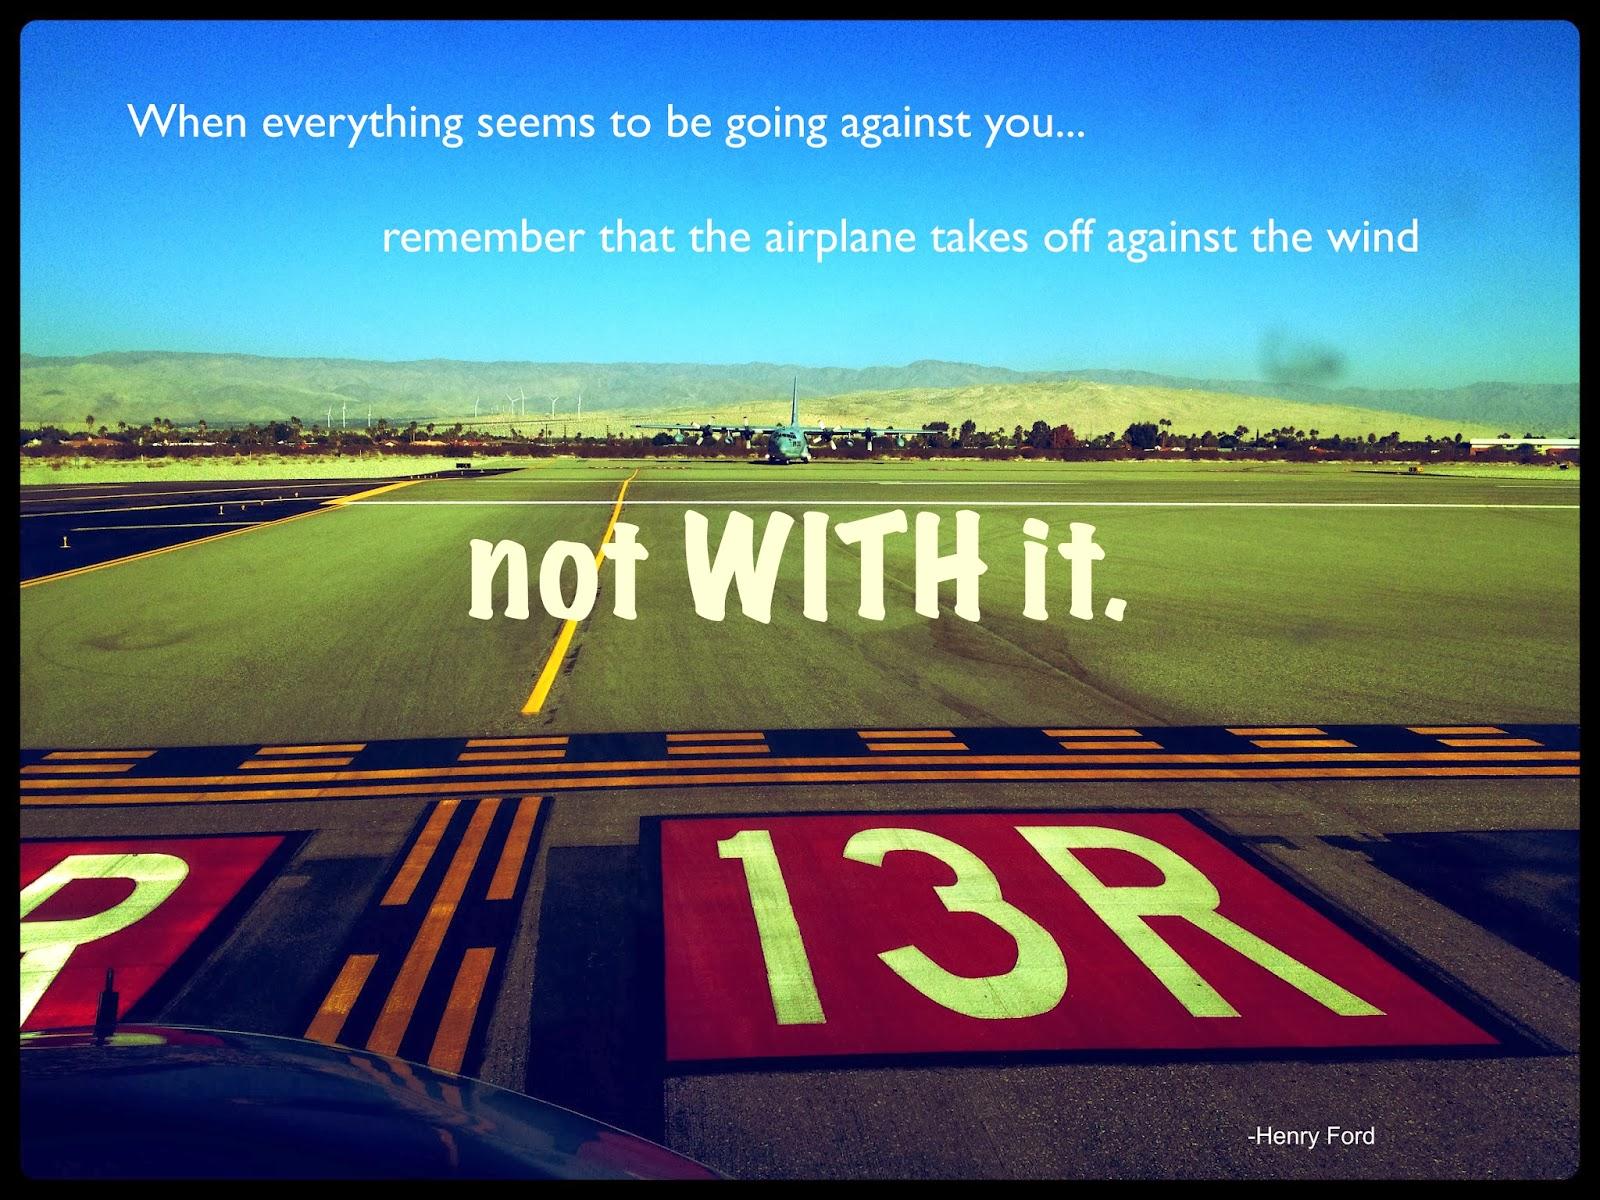 Trendy Pilots: Motivational Quotes/Pictures 2014